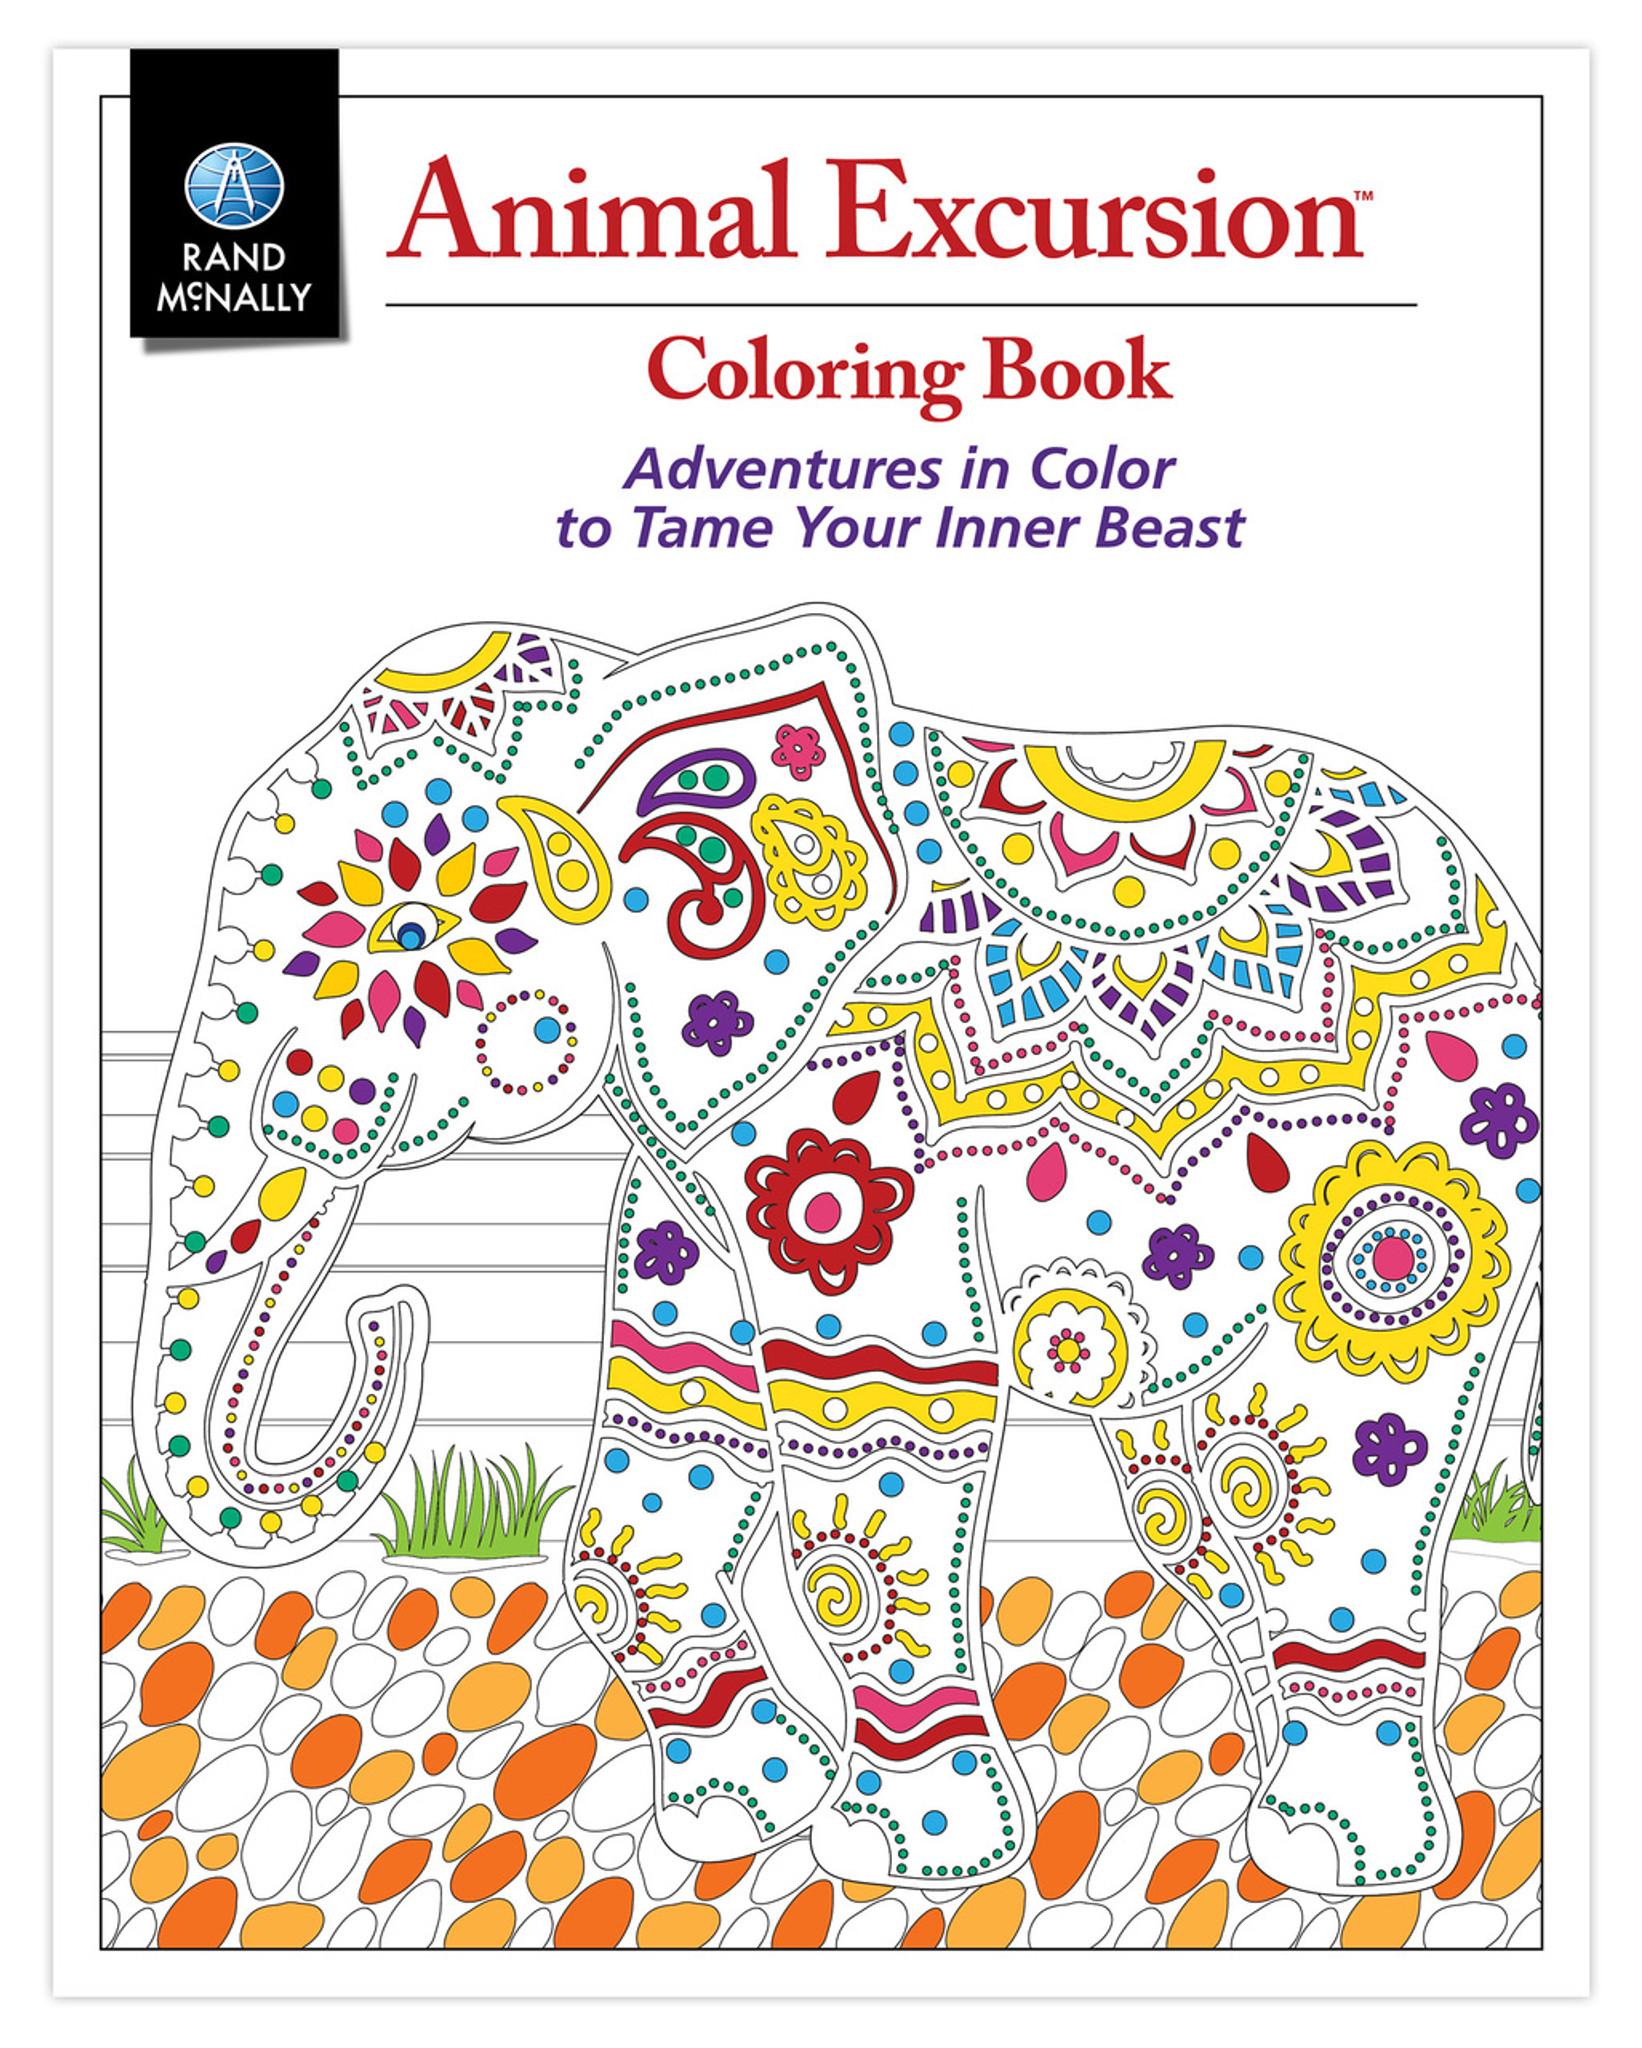 Book coloring - Animal Excursion Coloring Book